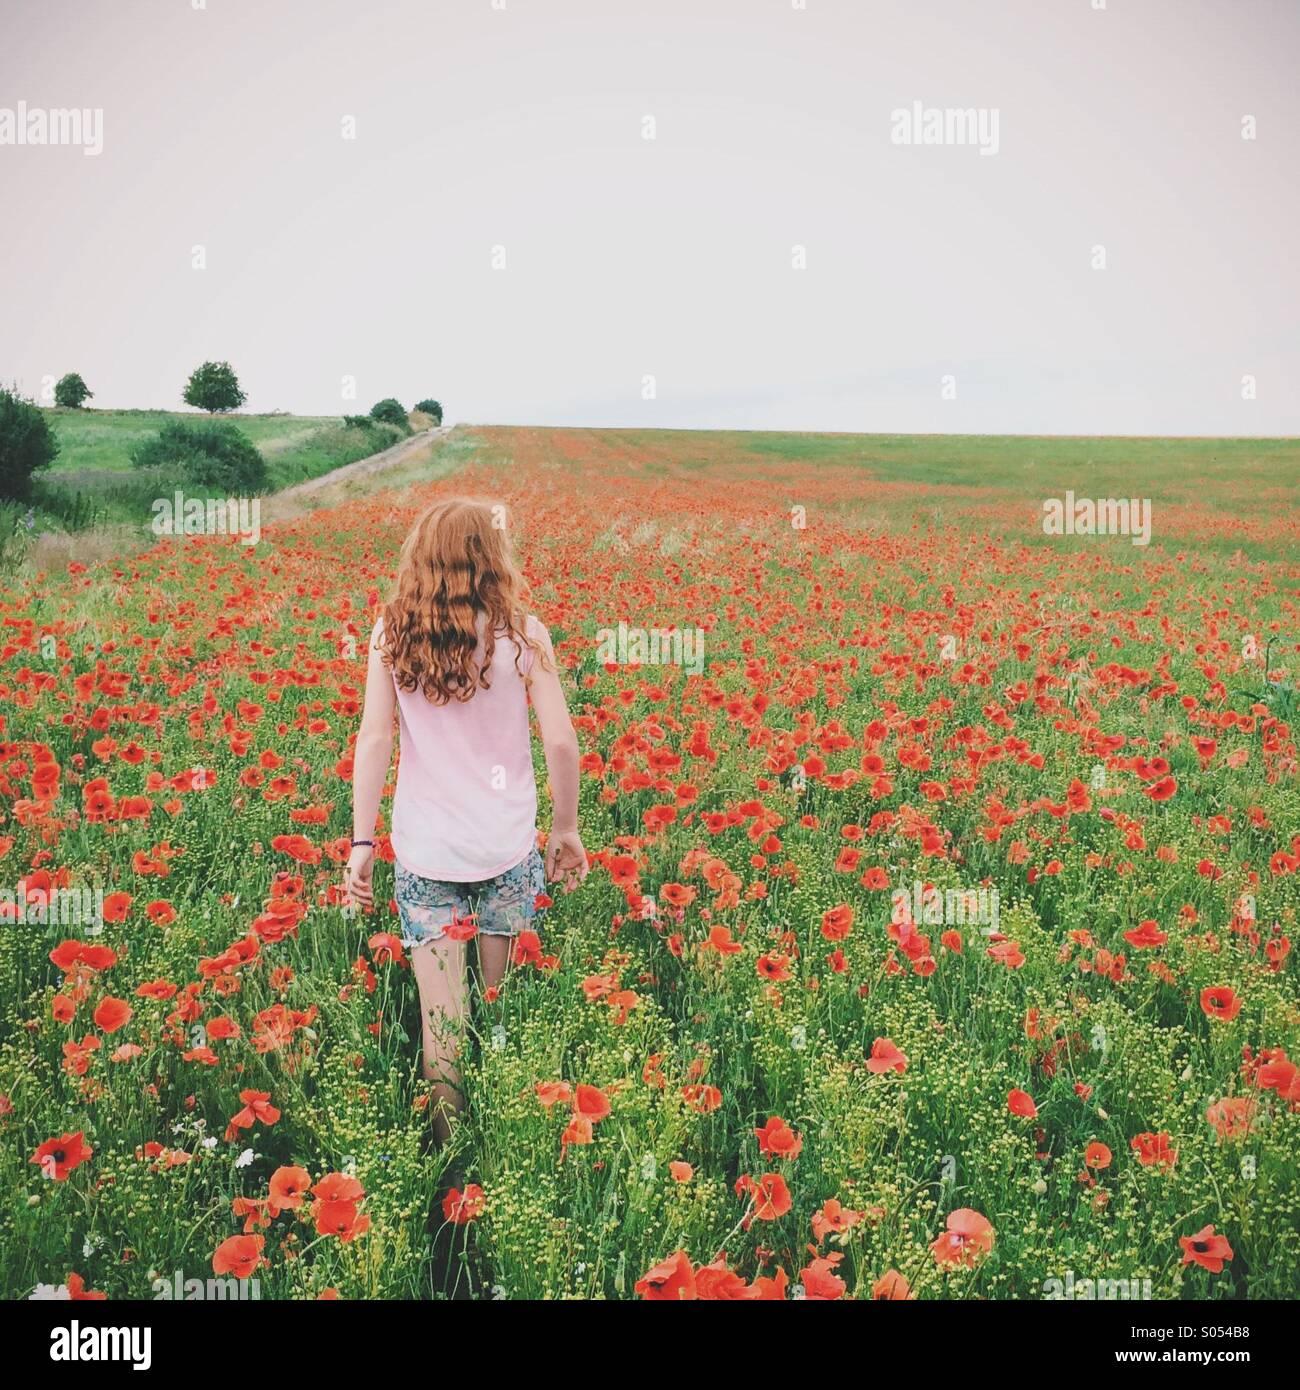 Chica en un campo de amapolas Imagen De Stock